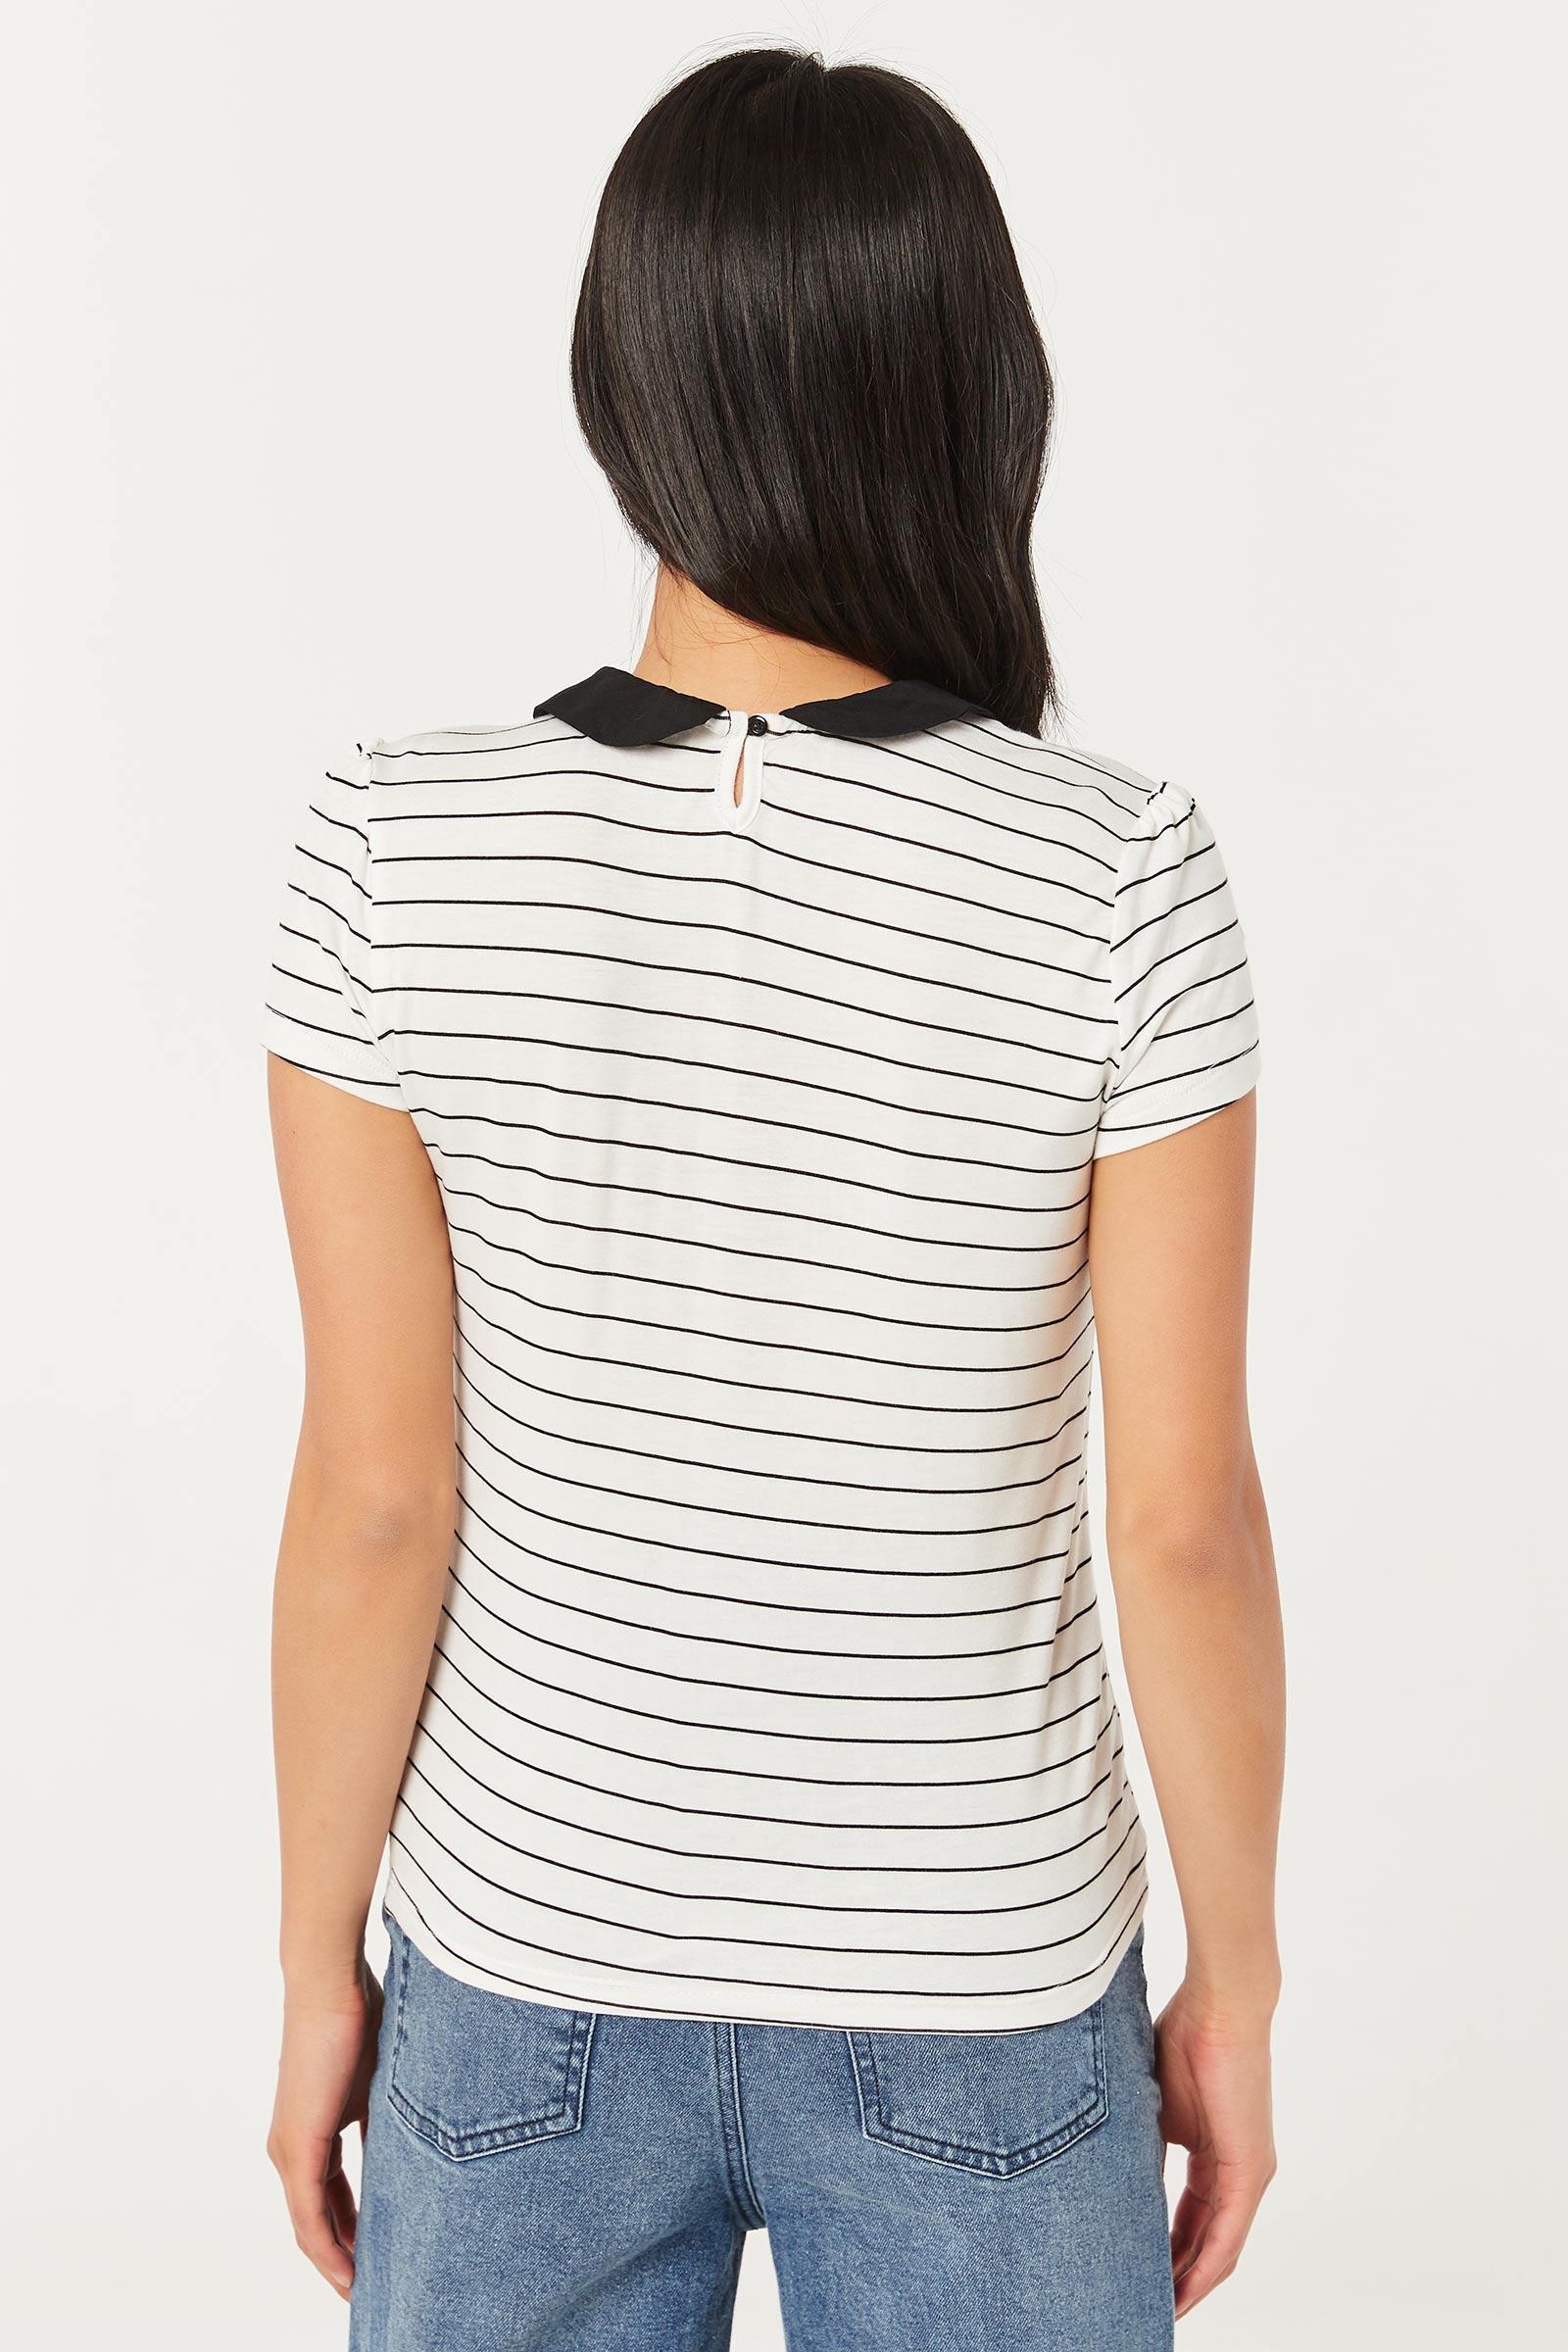 Striped Peter Pan T-shirt